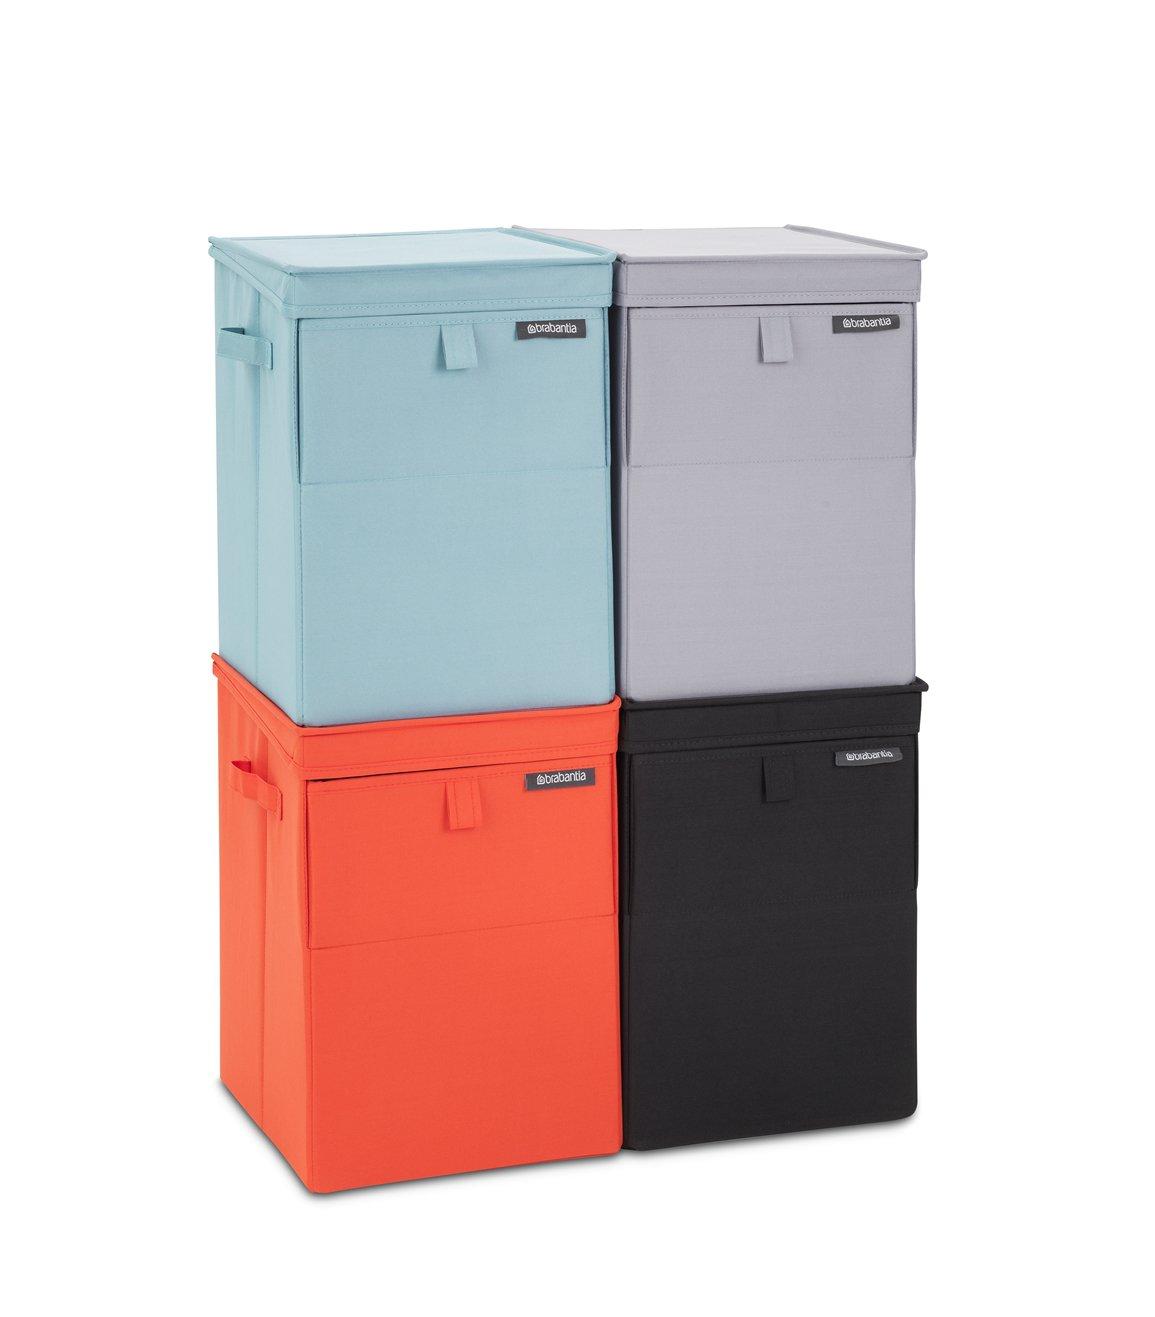 Brabantia Stackable Laundry Box 35 Litre Cool Grey At Barnitts Online Store Uk Barnitts